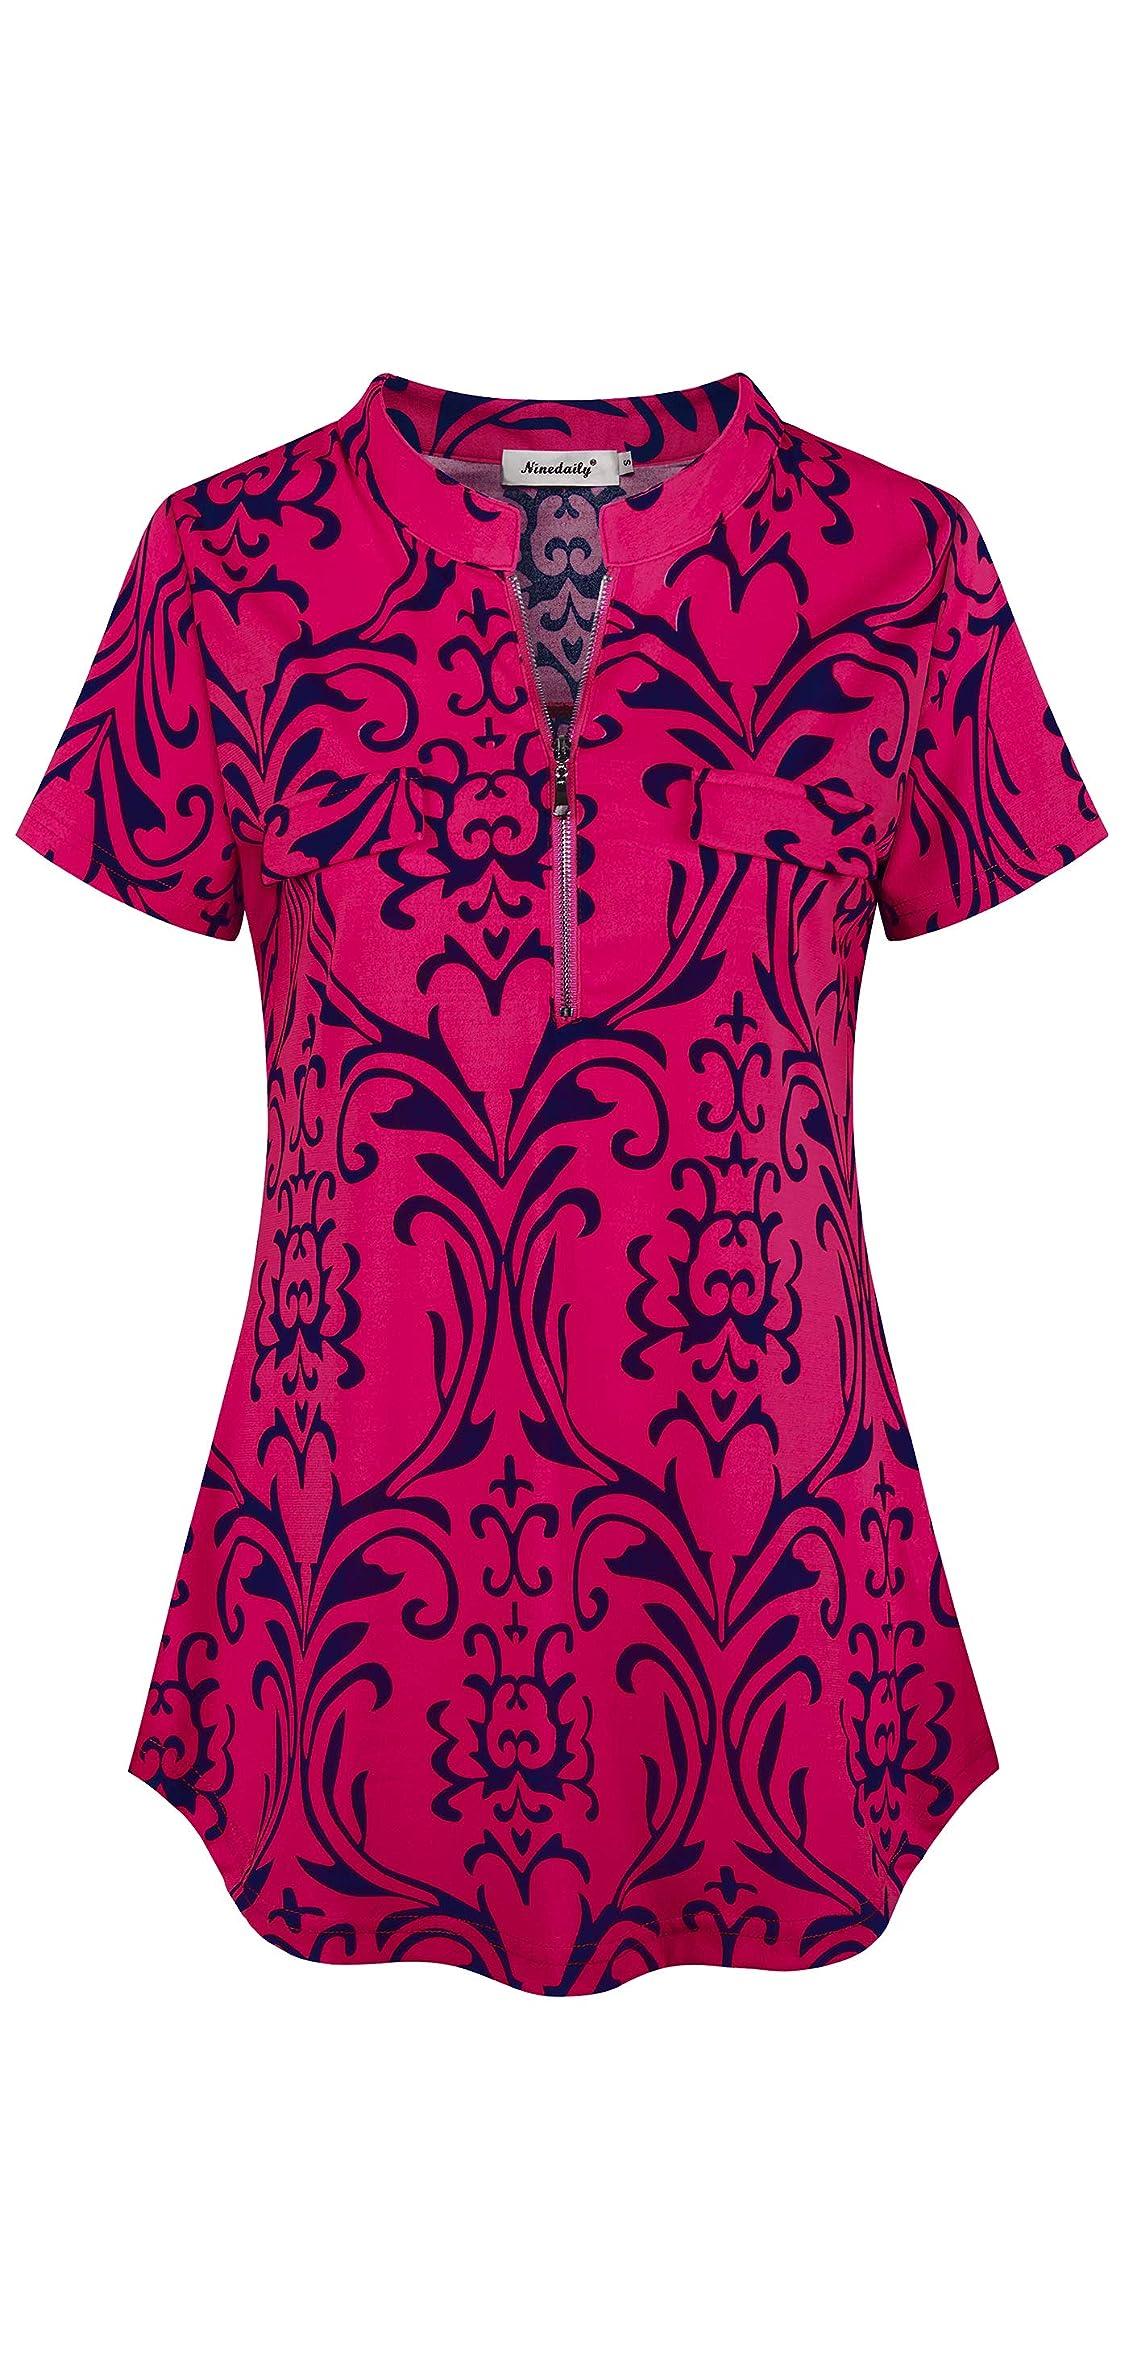 Women's Summer Tops Short Sleeve Casual Blouse Zip